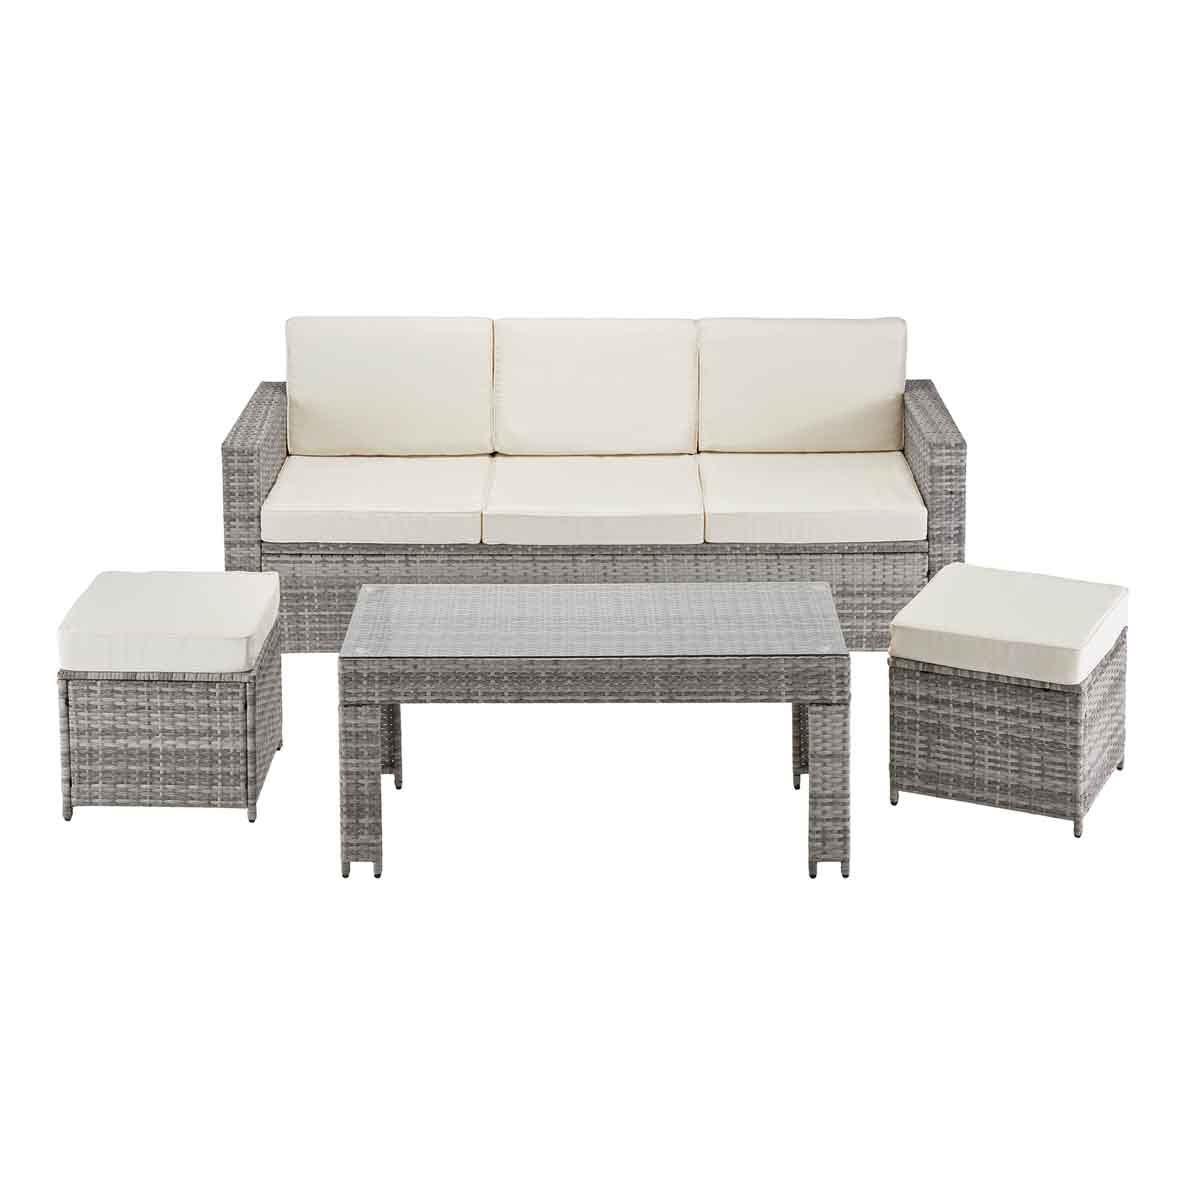 Garden Gear Riviera 5 Seat Rattan Sofa Set - Light Grey